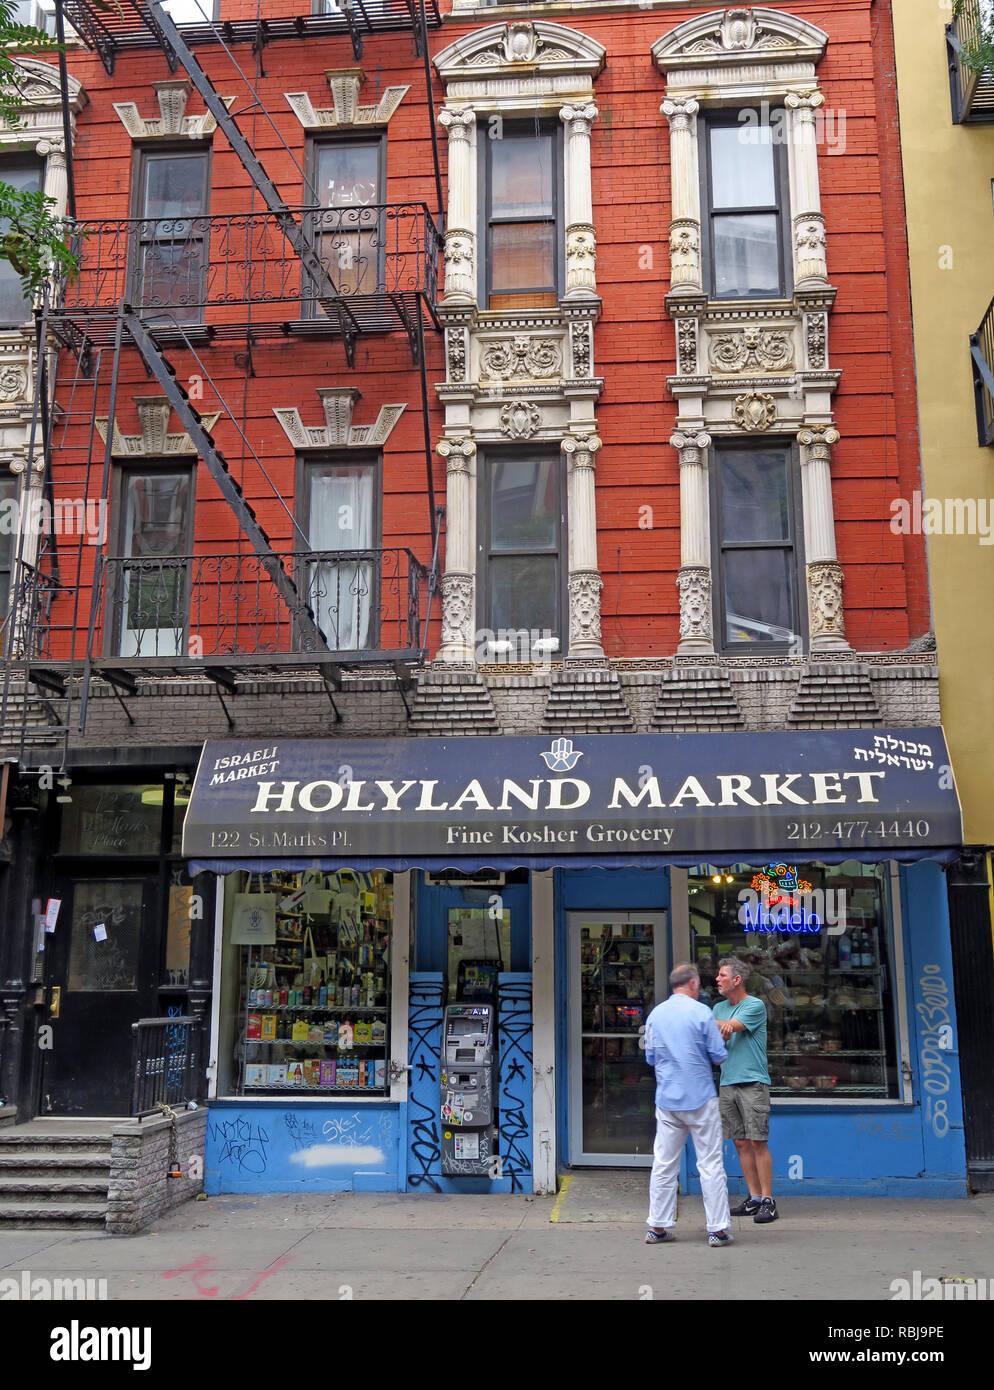 Two men outside Holyland Market, 122 St Marks Place, East Village, New York, NYC, NY, USA Stock Photo